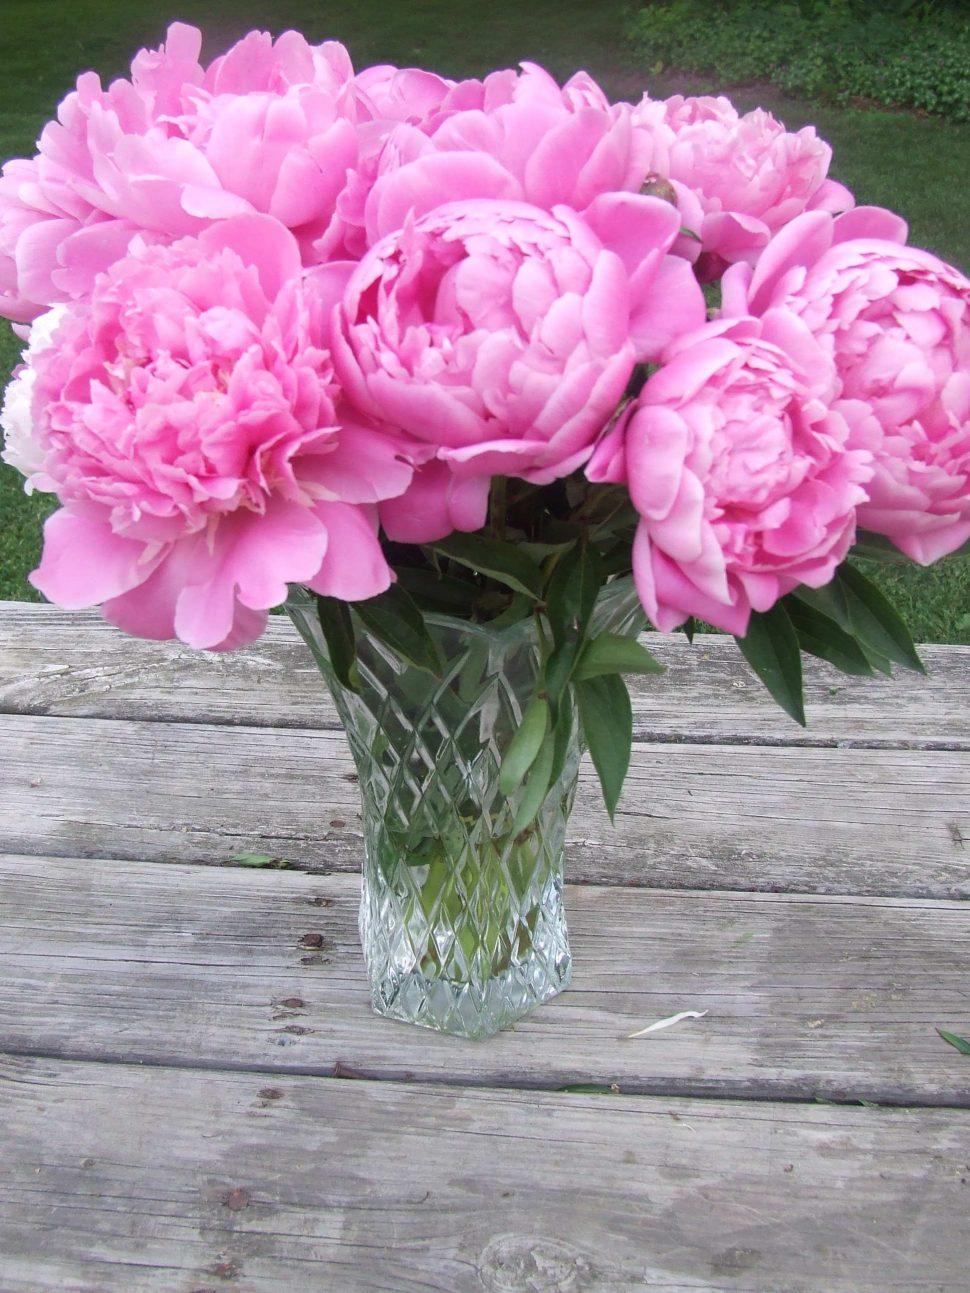 Drawn peony flower vase Vase Peonies Flowers  About